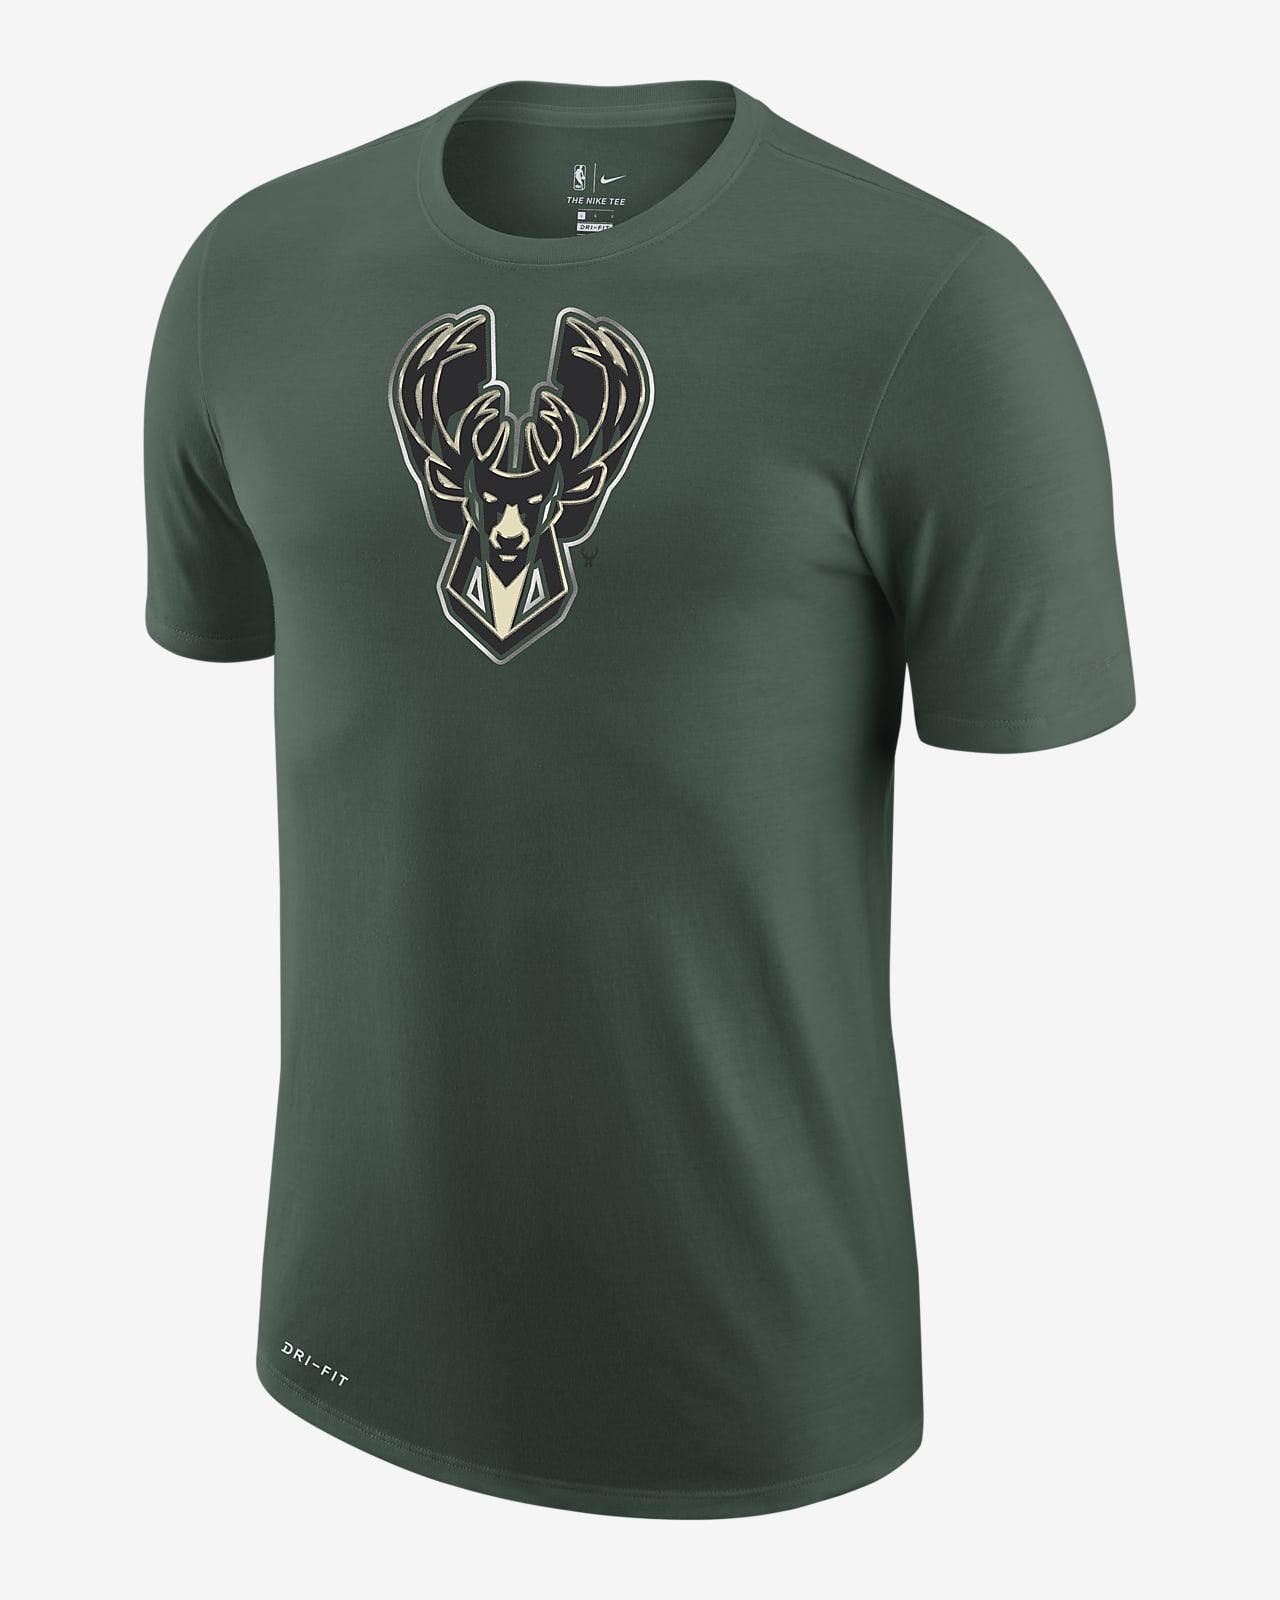 Playera con logotipo de la NBA Nike Dri-FIT para hombre Milwaukee Bucks Earned Edition